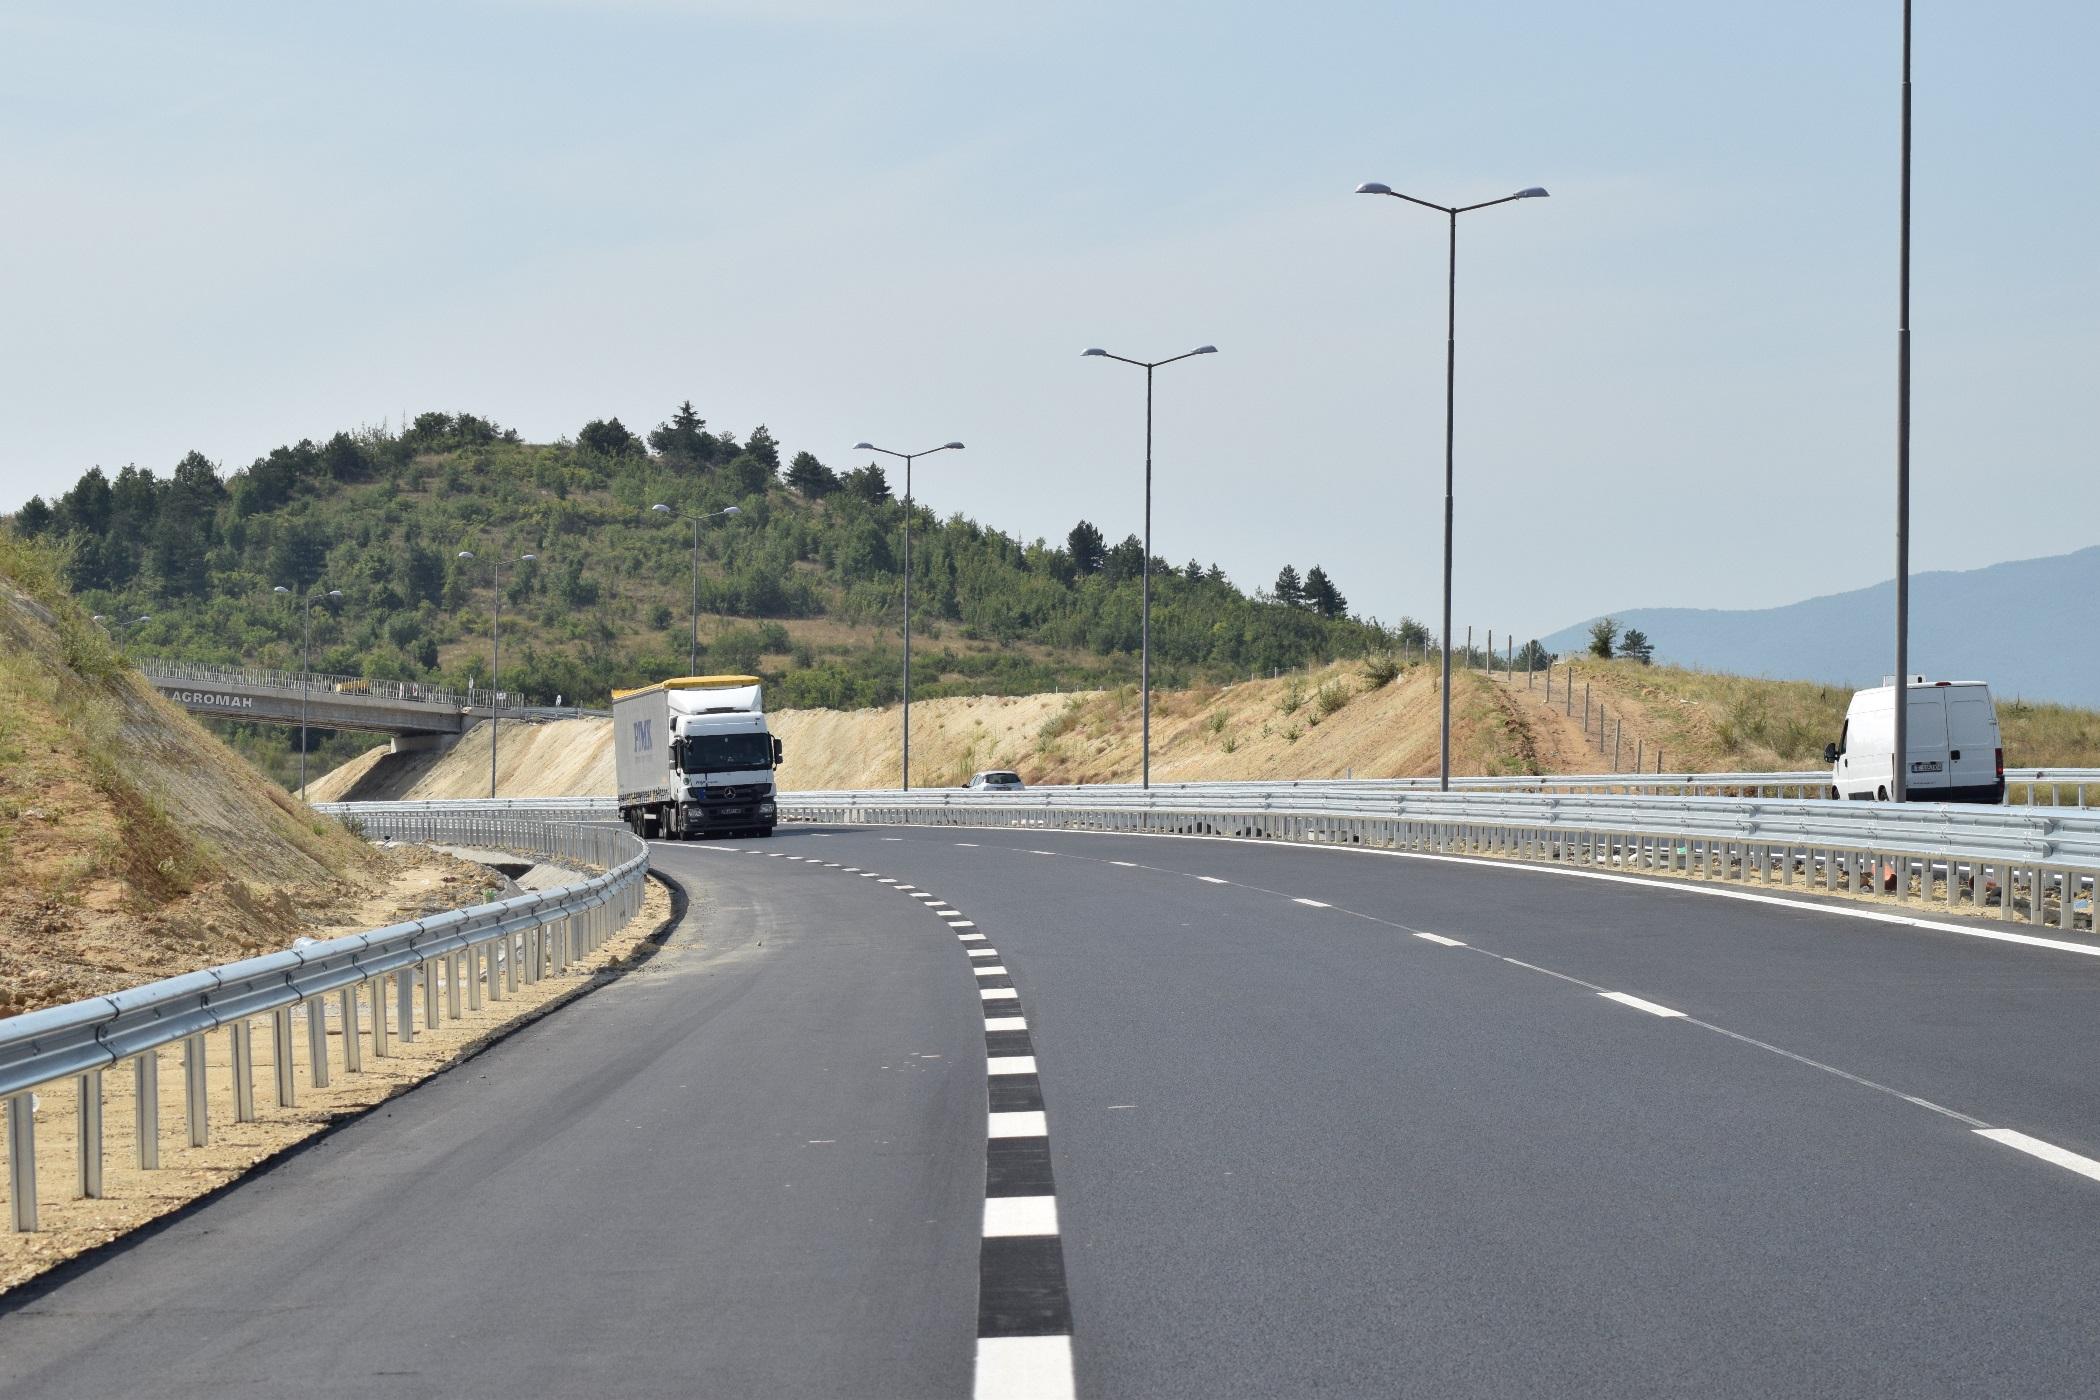 Bulgaria plans to build Ruse - Veliko Tarnovo motorway by 2022